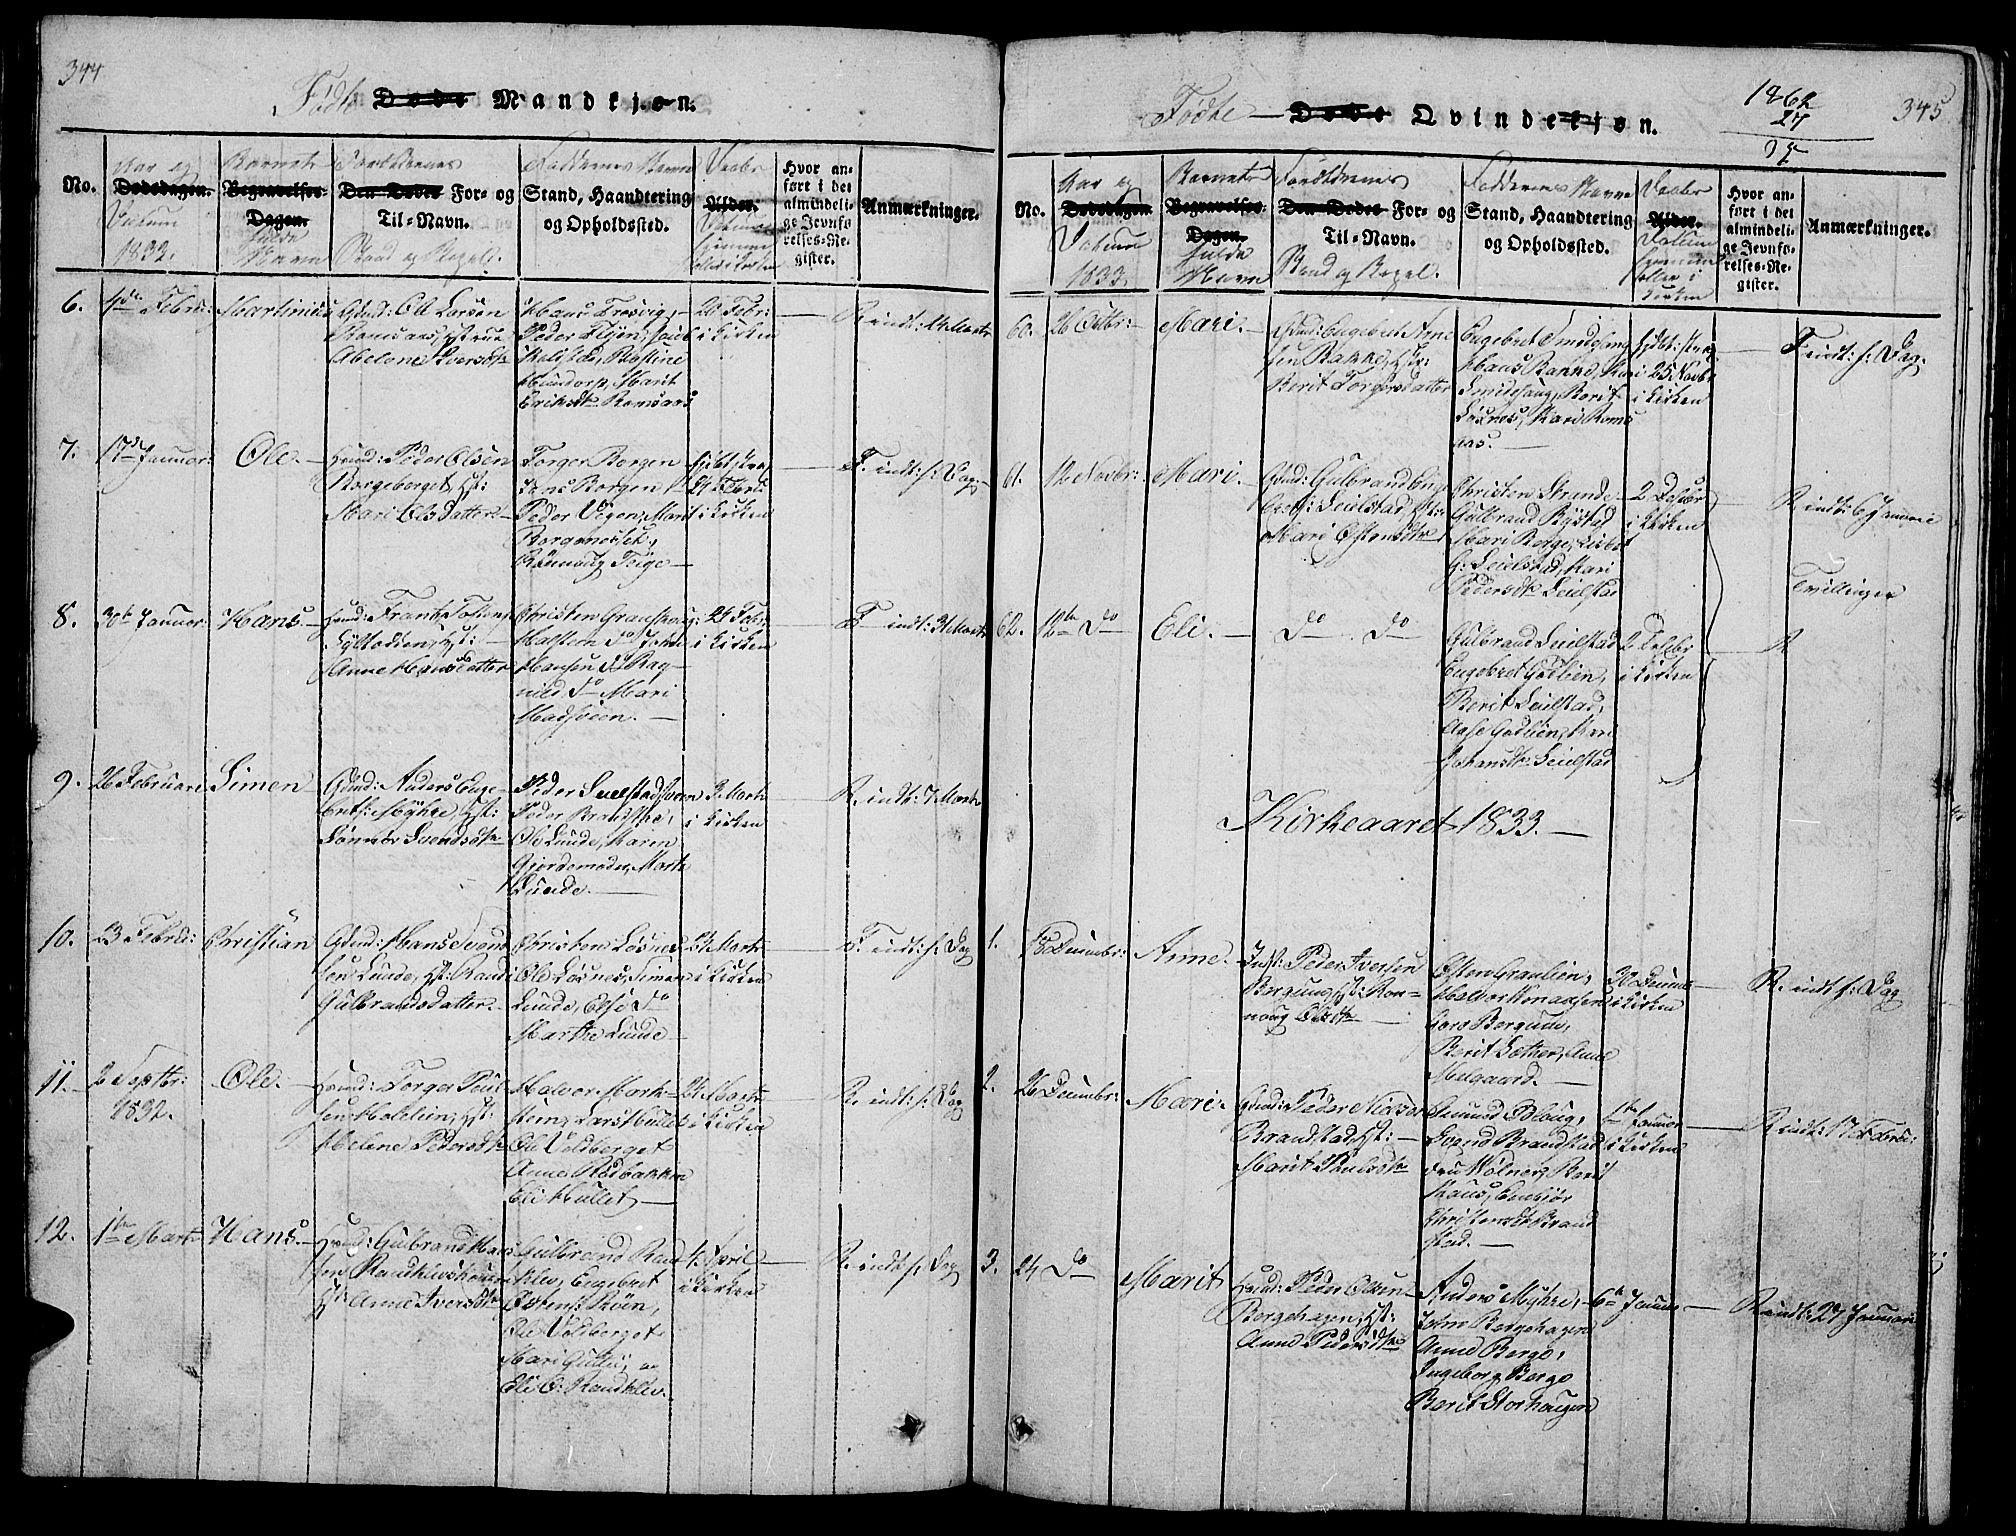 SAH, Ringebu prestekontor, Klokkerbok nr. 1, 1821-1839, s. 344-345